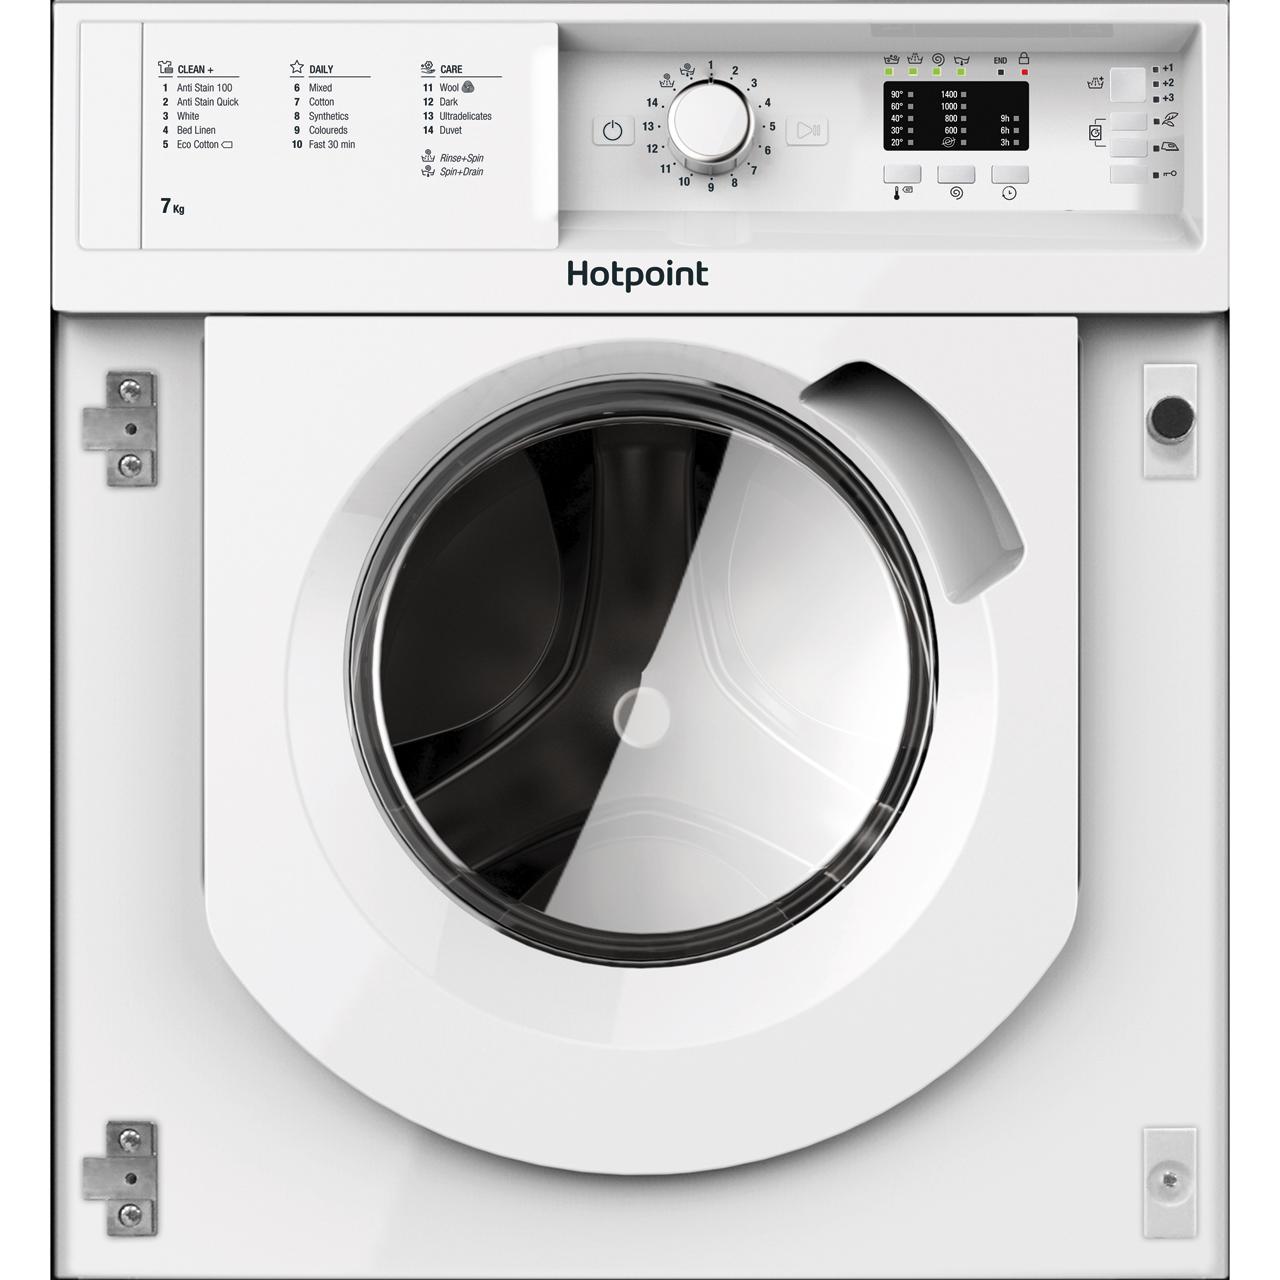 hotpoint biwmhl71453uk built in washing machine white. Black Bedroom Furniture Sets. Home Design Ideas